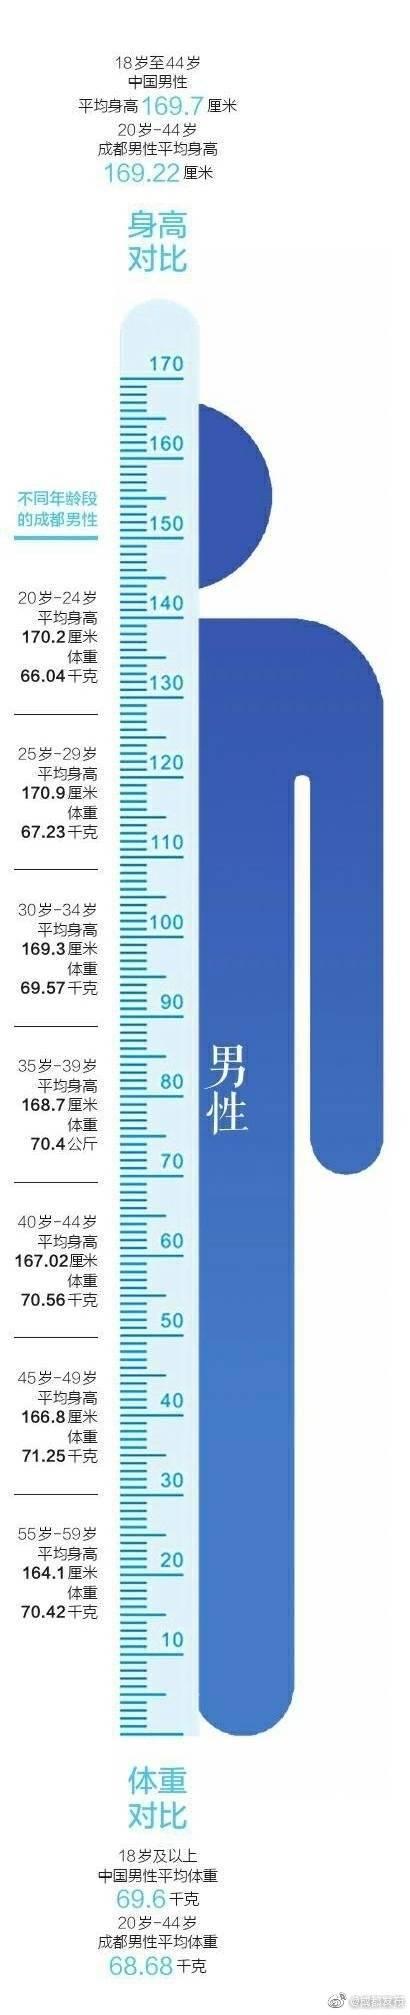 体重 平均 中 2 【身長・体重】中学生の平均【男子、女子、学年別】